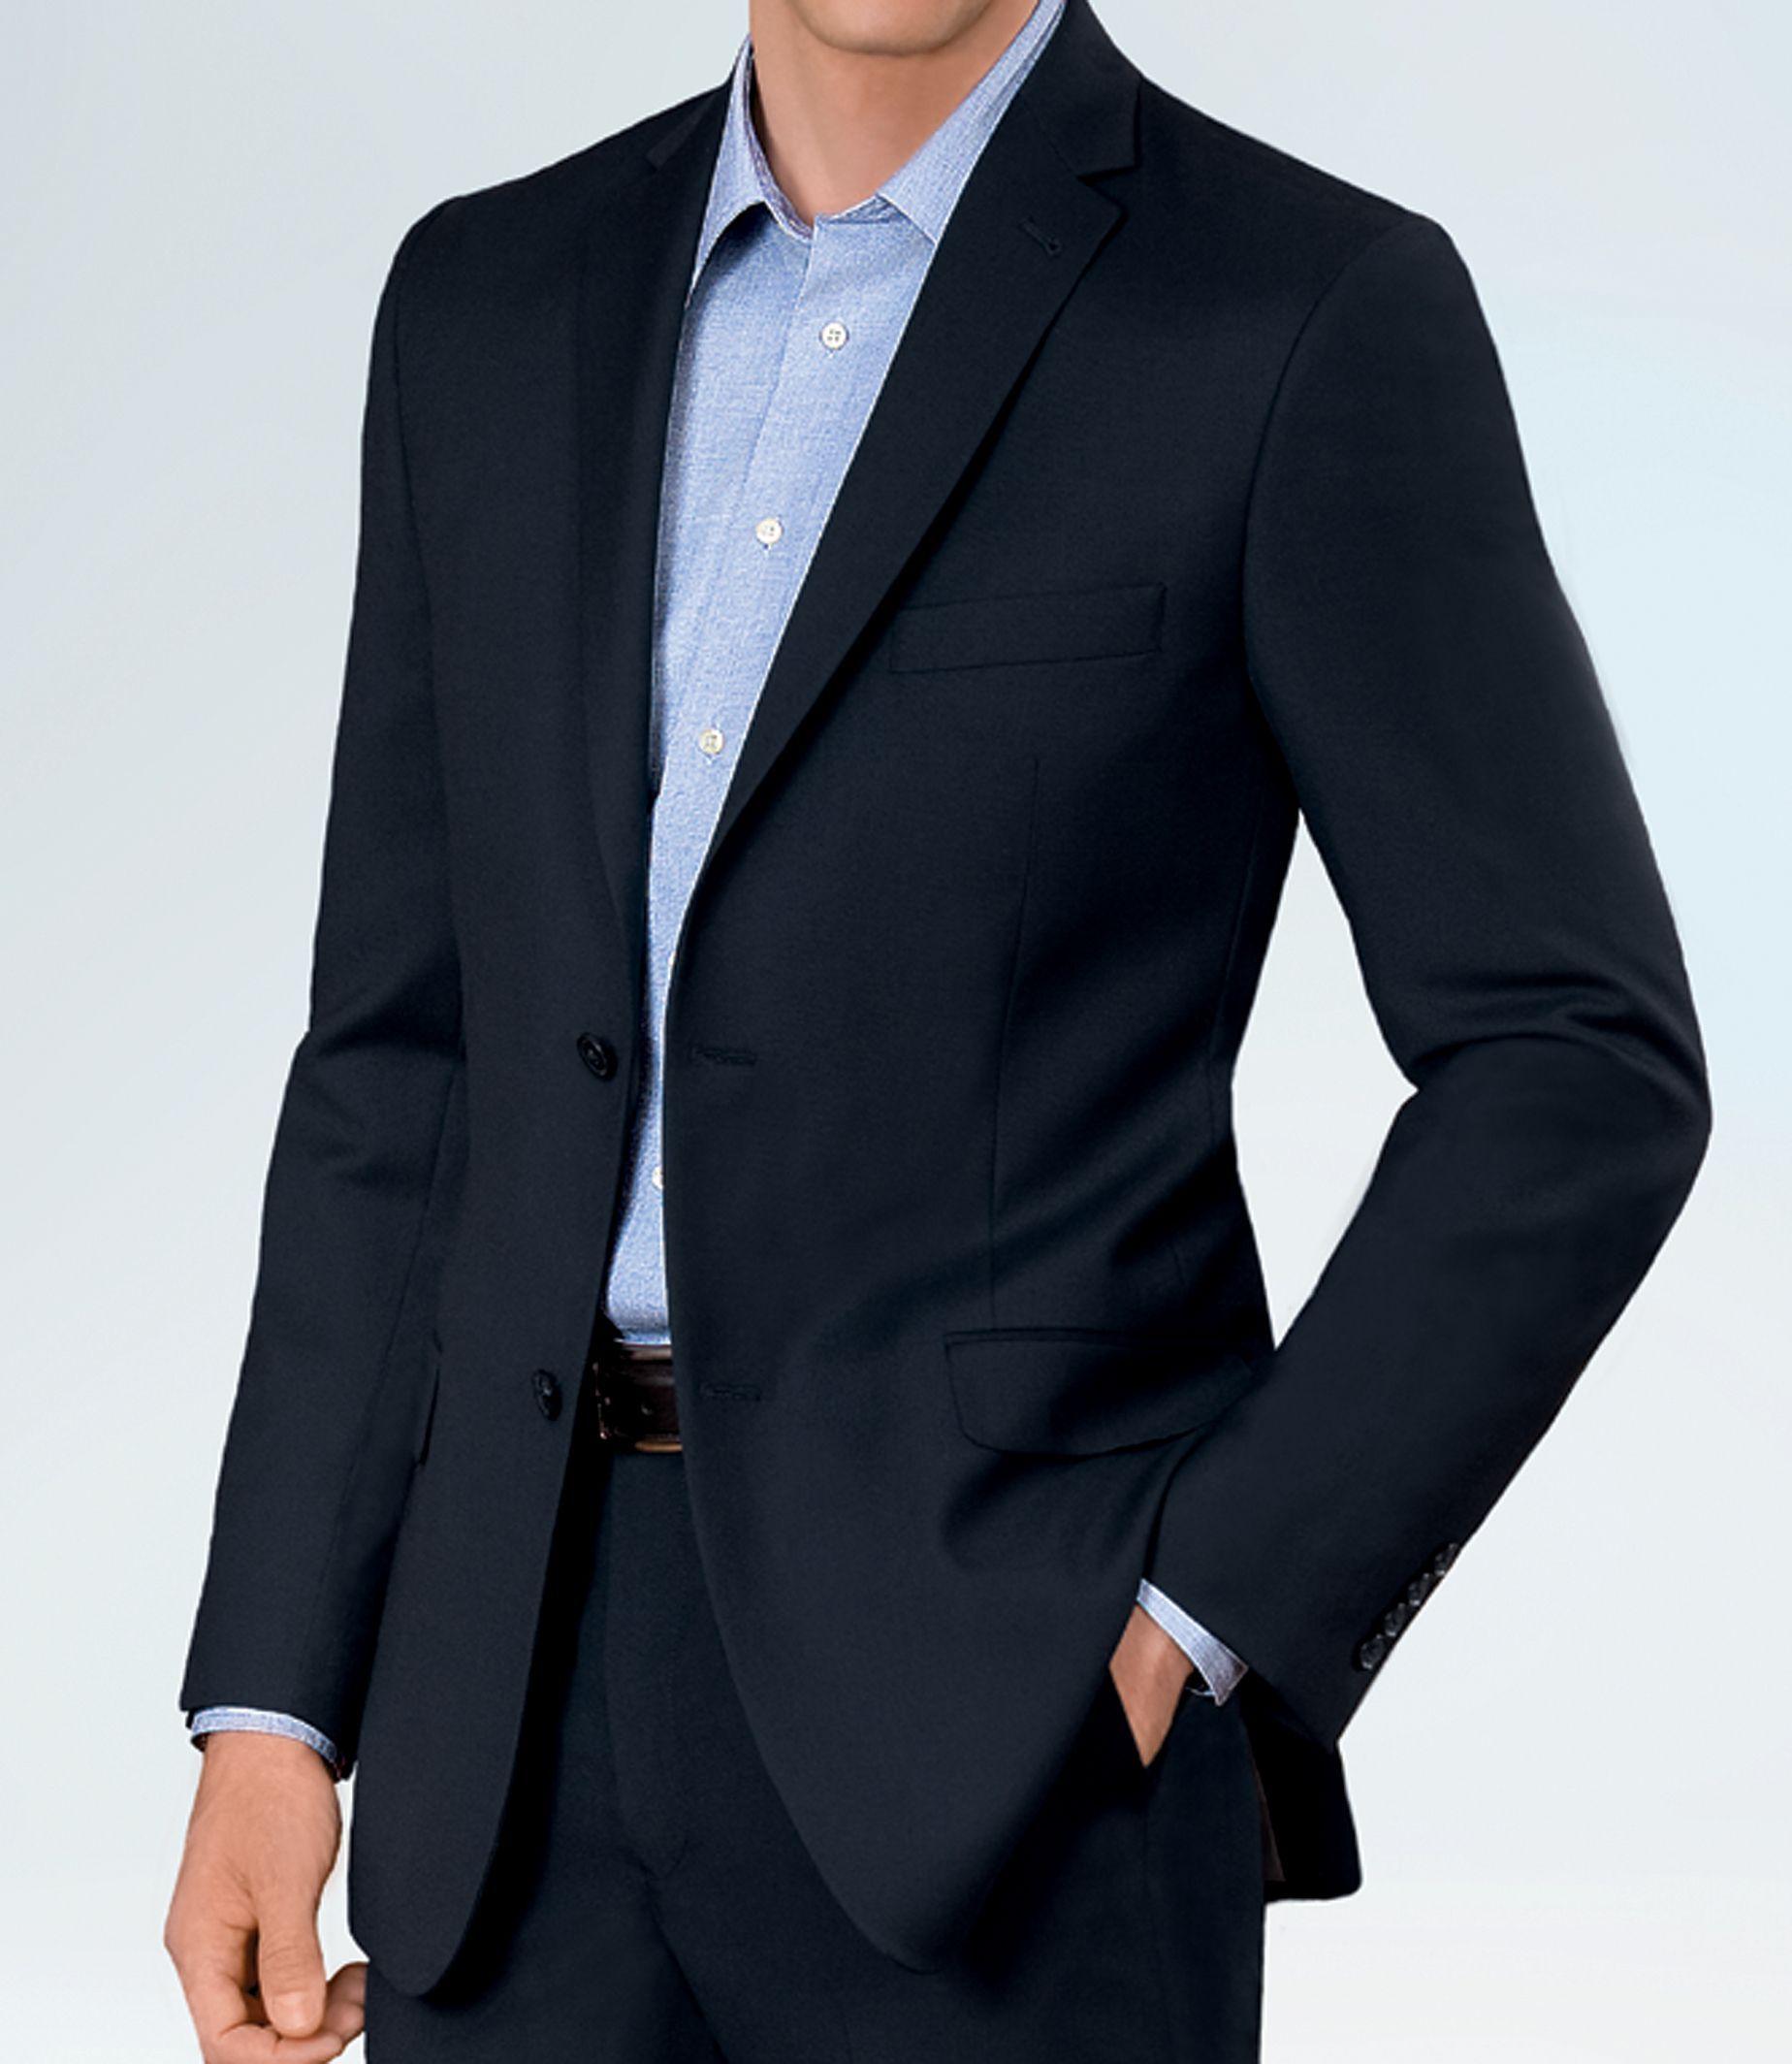 Crossover Slim Fit 2 Button Suit Plain Front Trousers Suits Mens Fashion Wear Suits Clothing